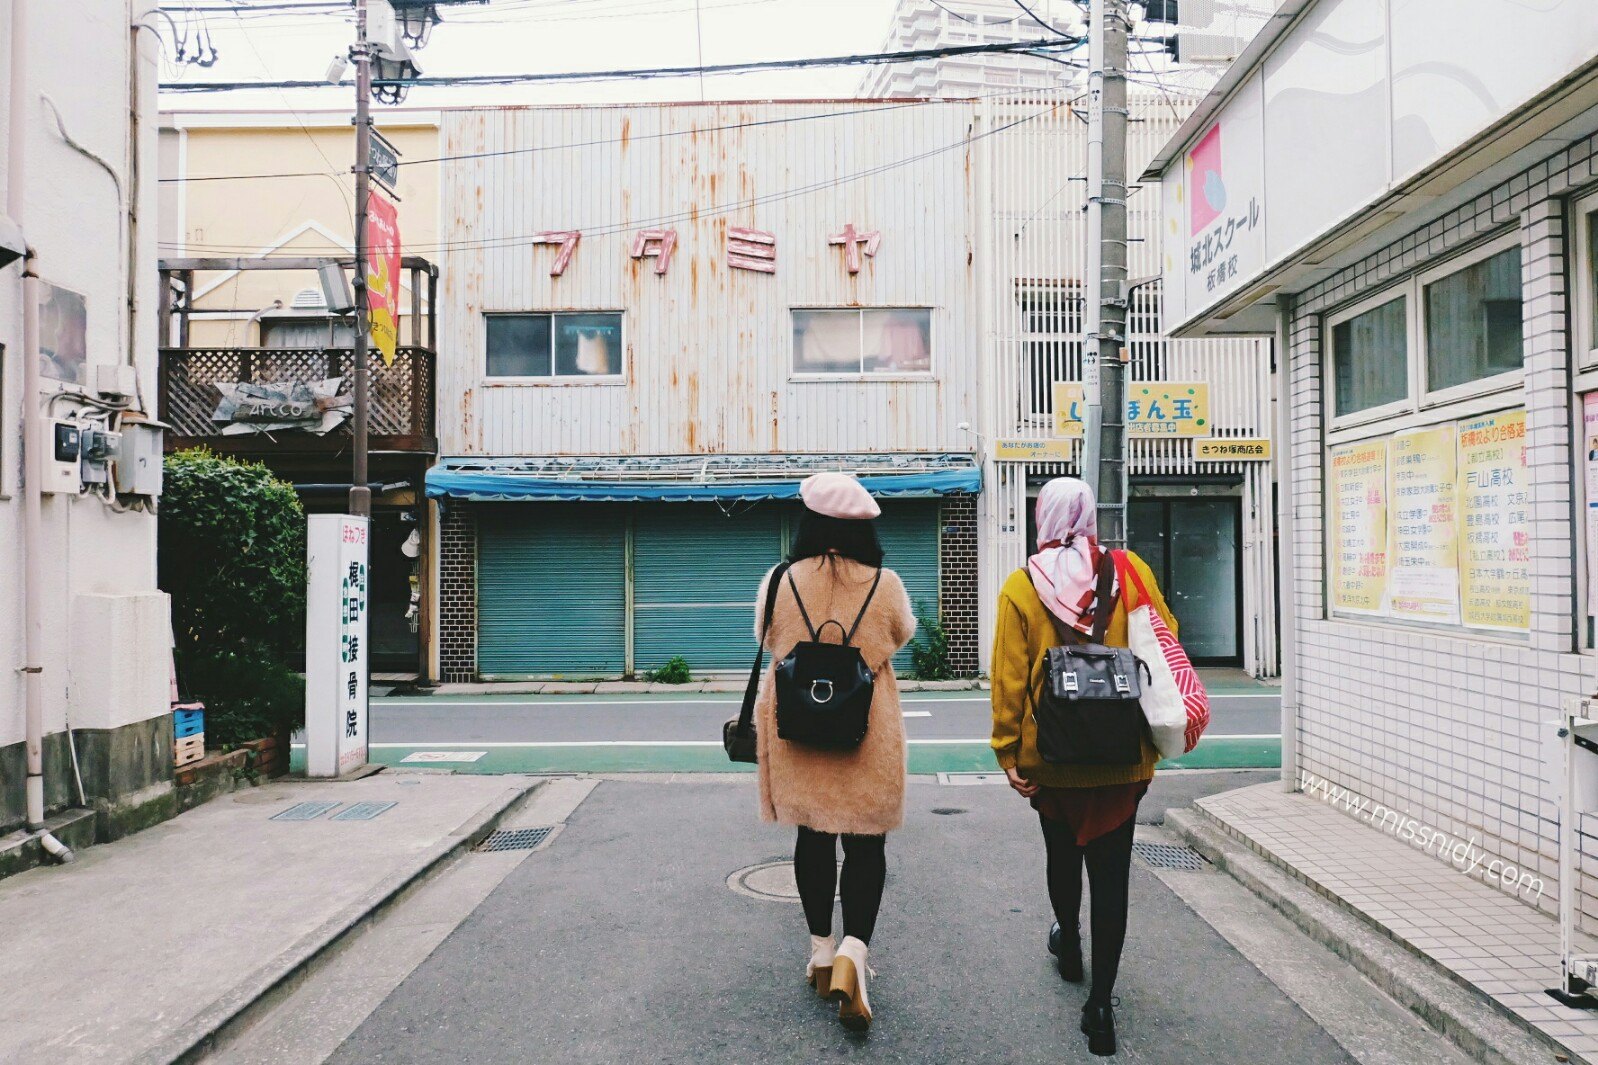 pengalaman travelling ke jepang pas musim semi